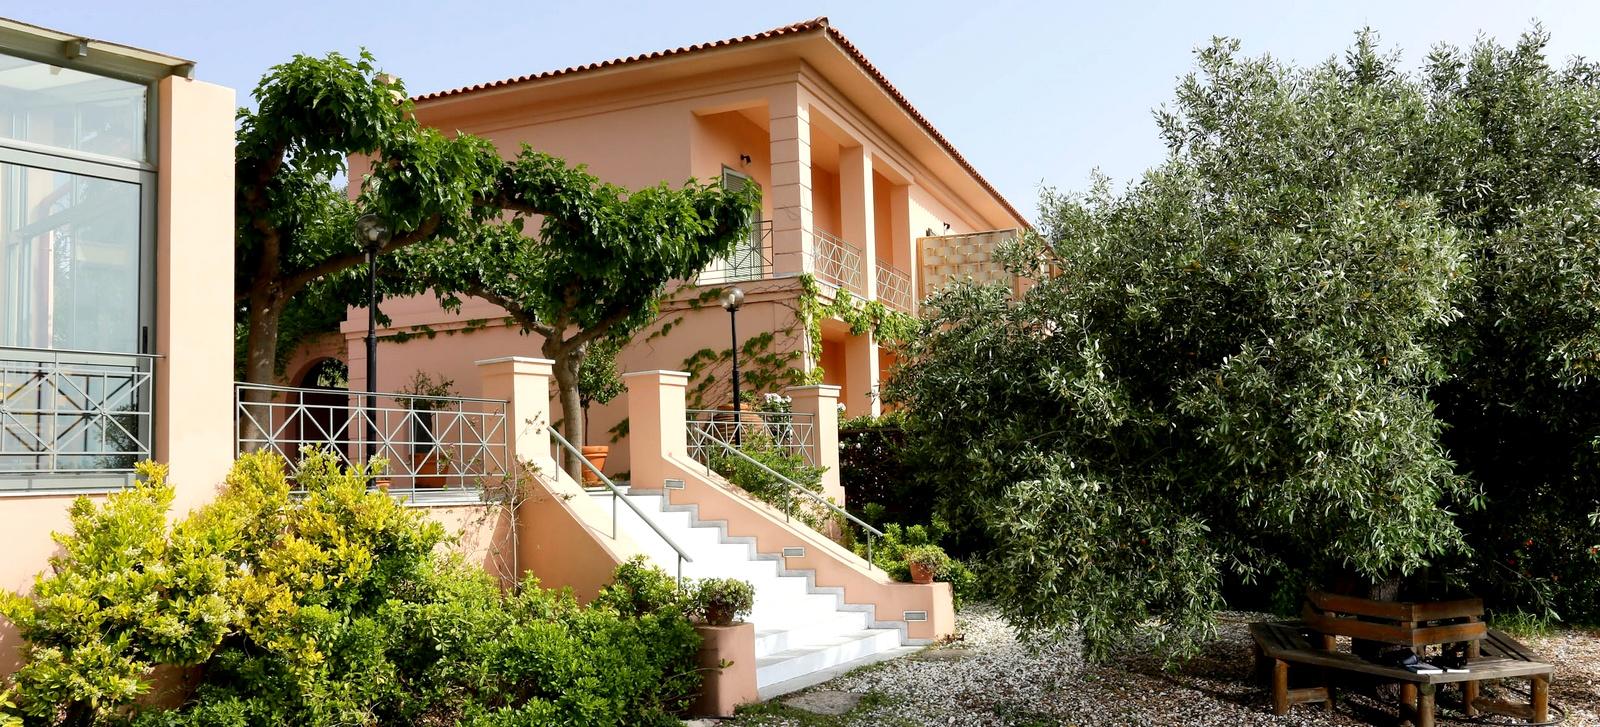 Eleonas Guesthouse